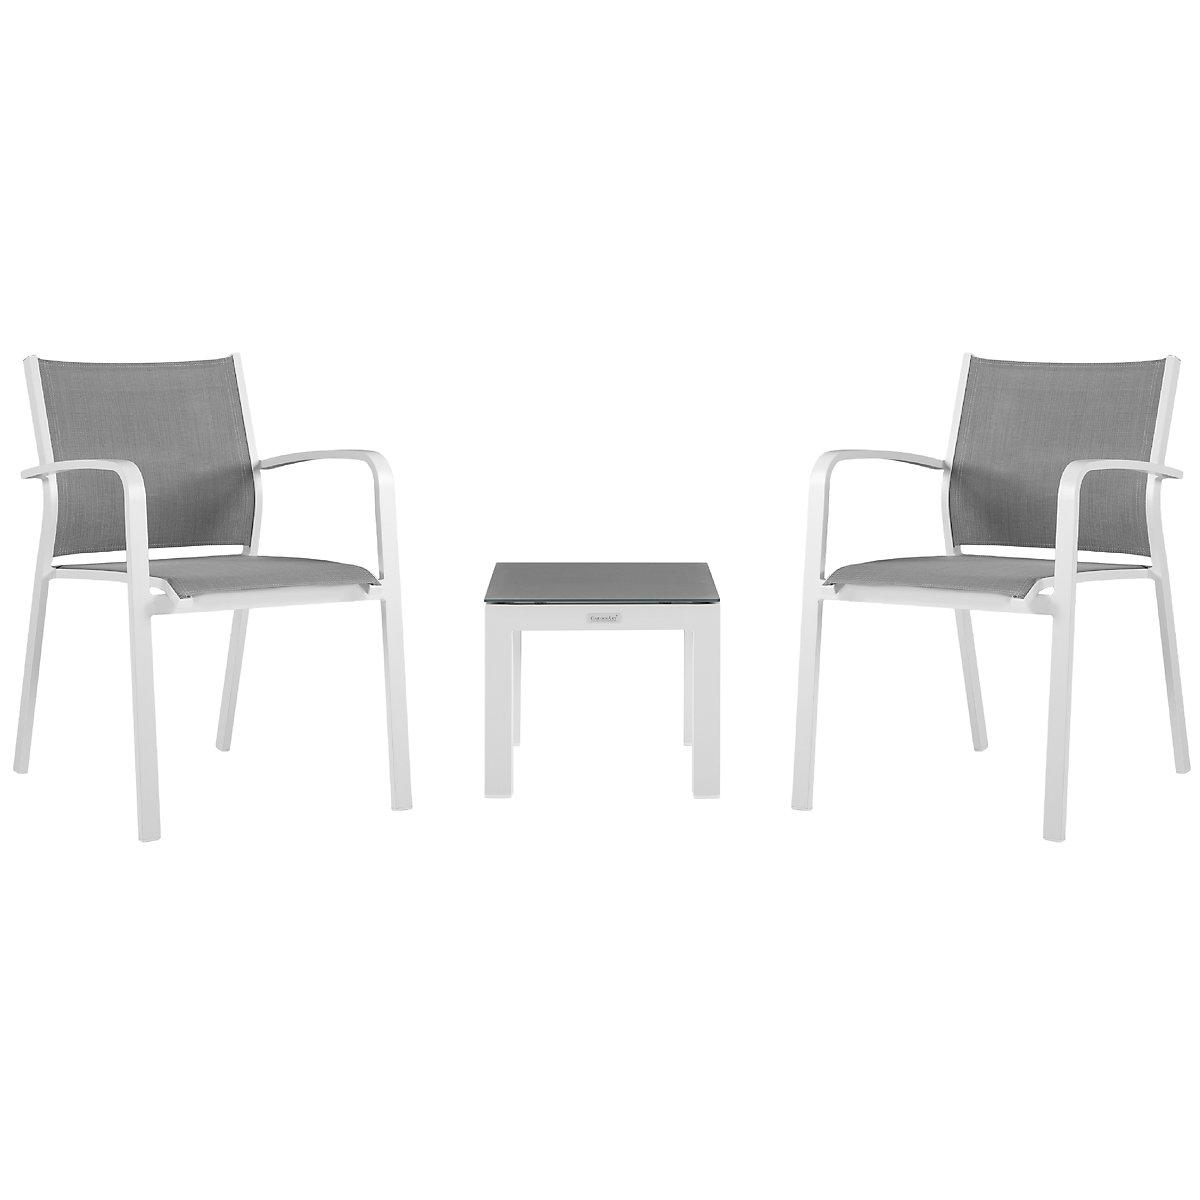 City Furniture Lisbon Gray Sling Chair